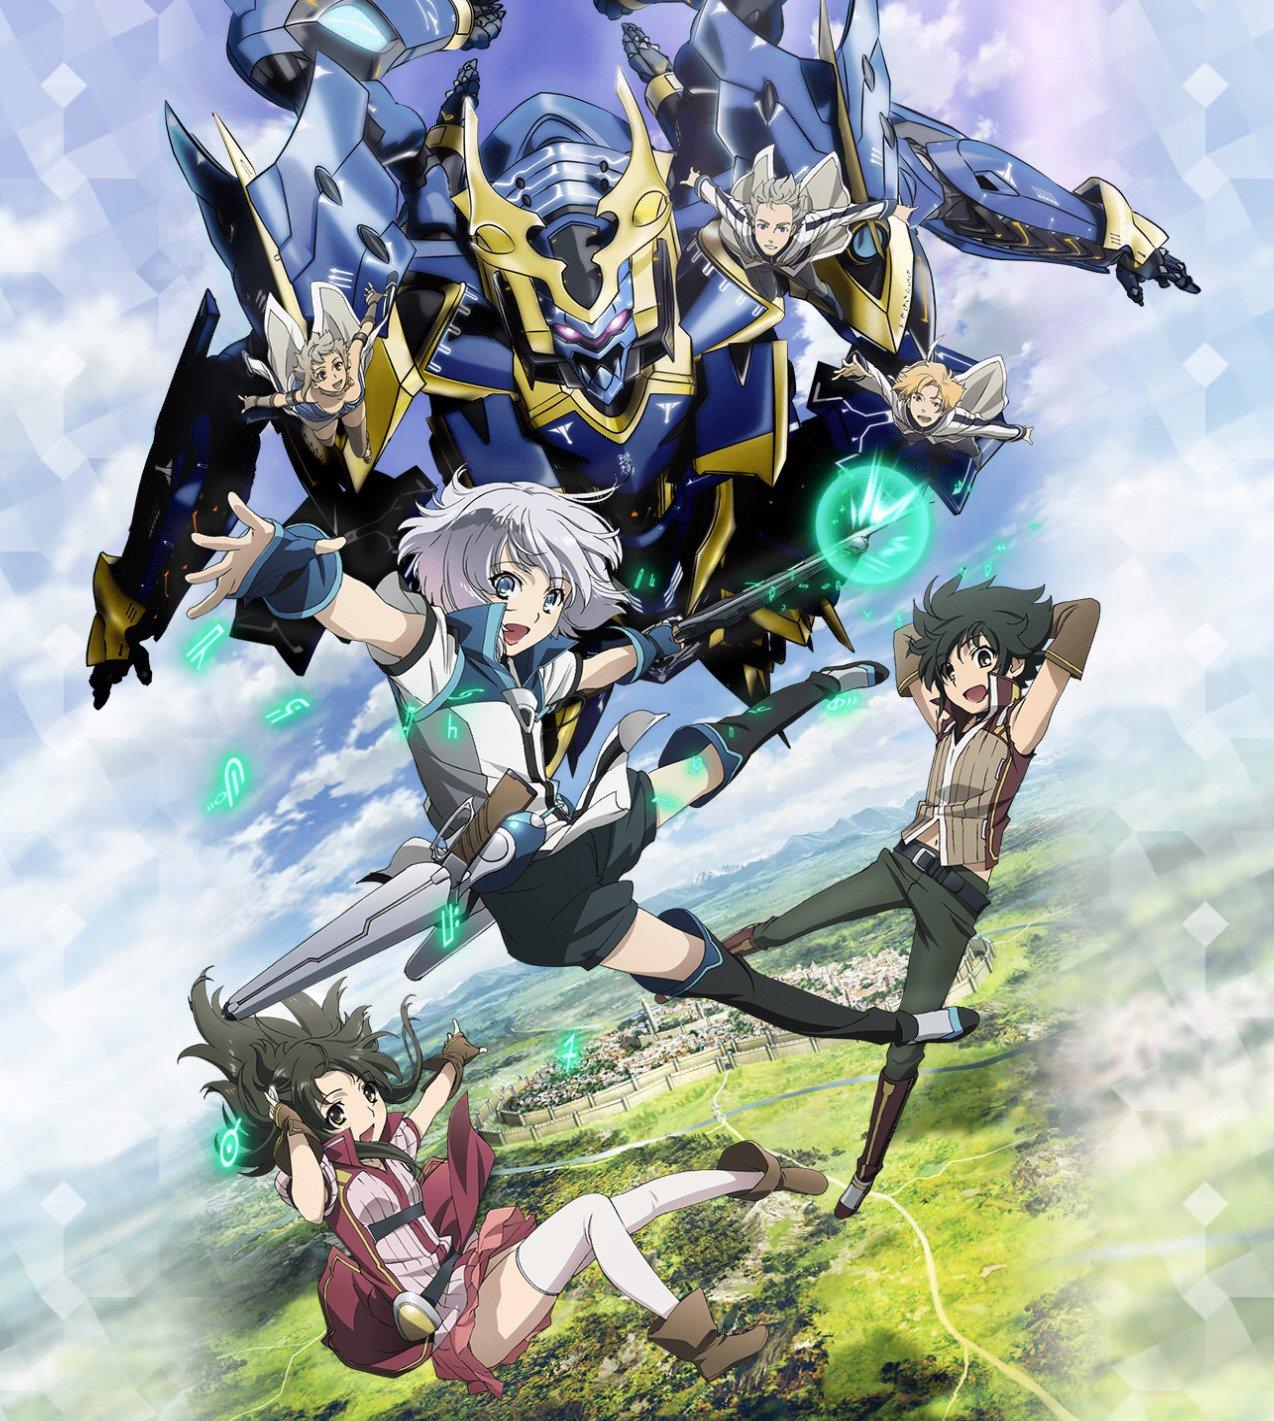 Anime Knights & Magic